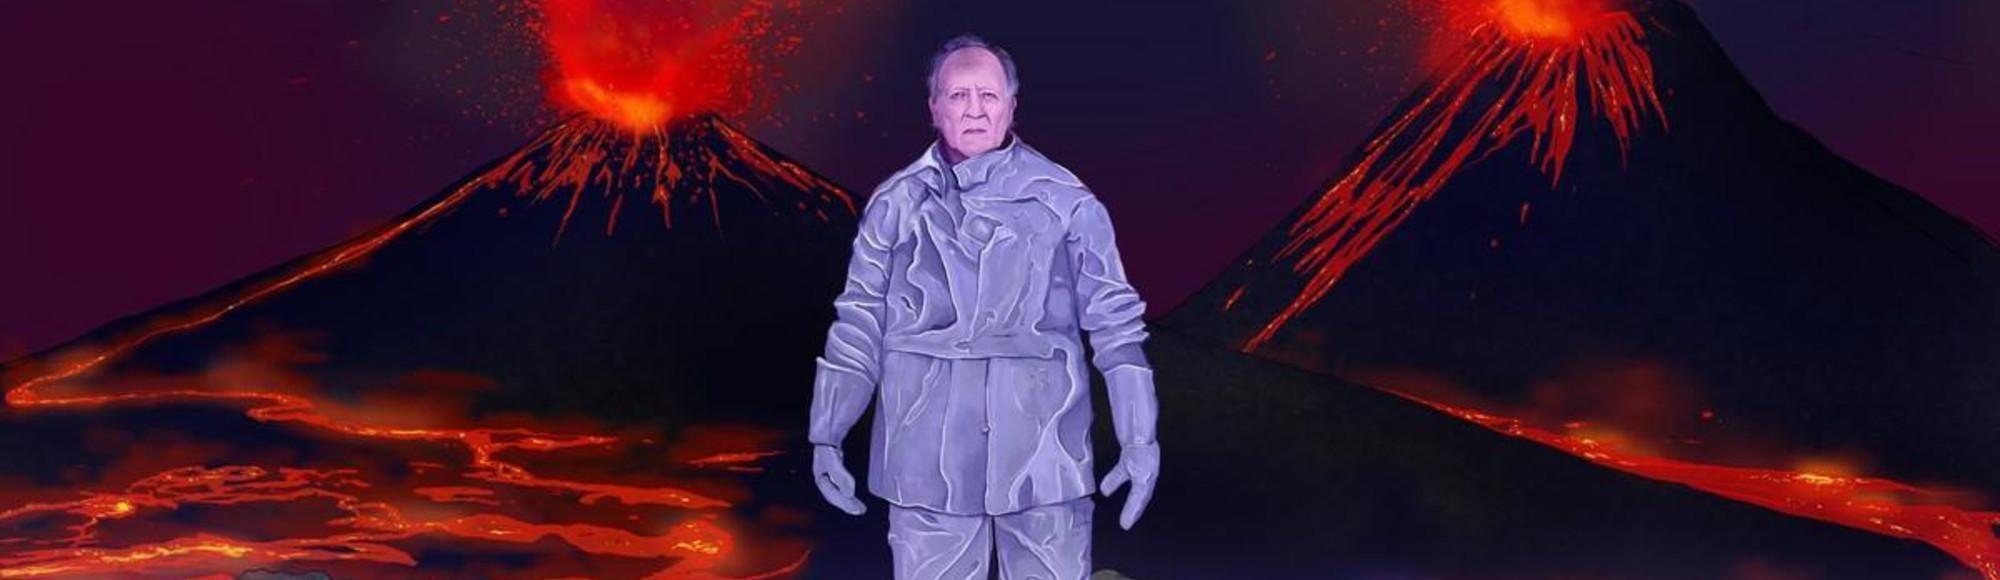 Werner Herzog Really, Really Likes Volcanoes